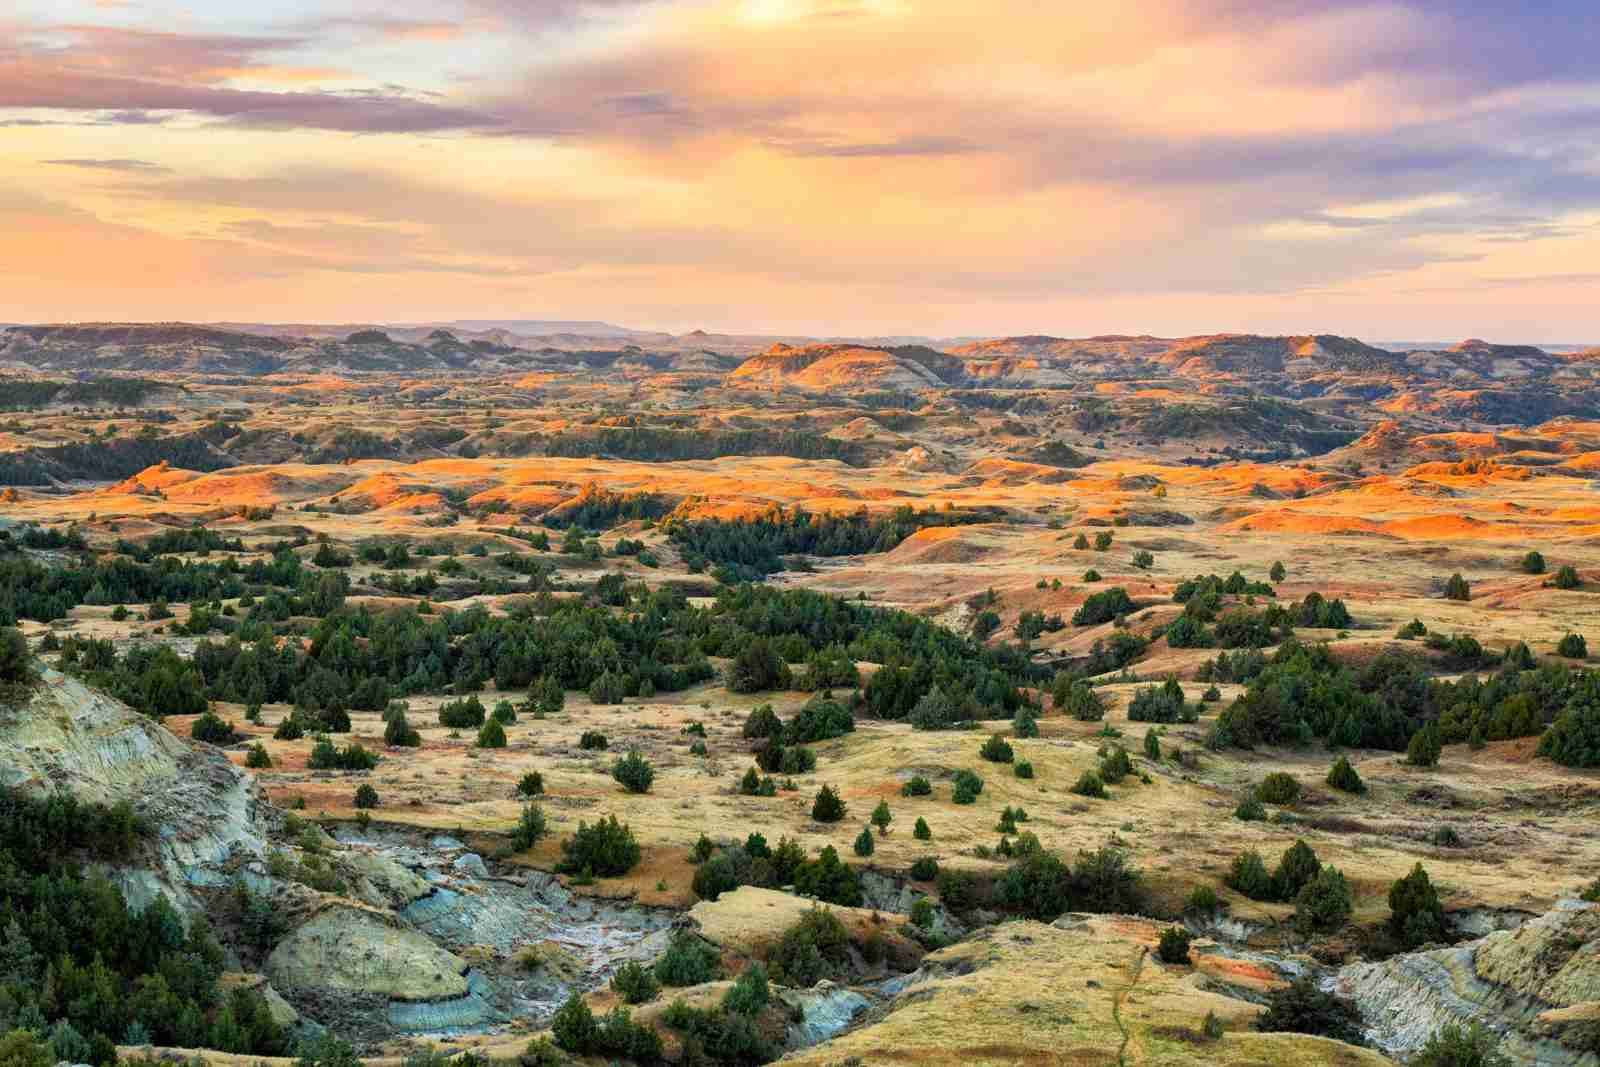 An aerial view of Theodore Roosevelt National Park, North Dakota. (Photo via Shutterstock)